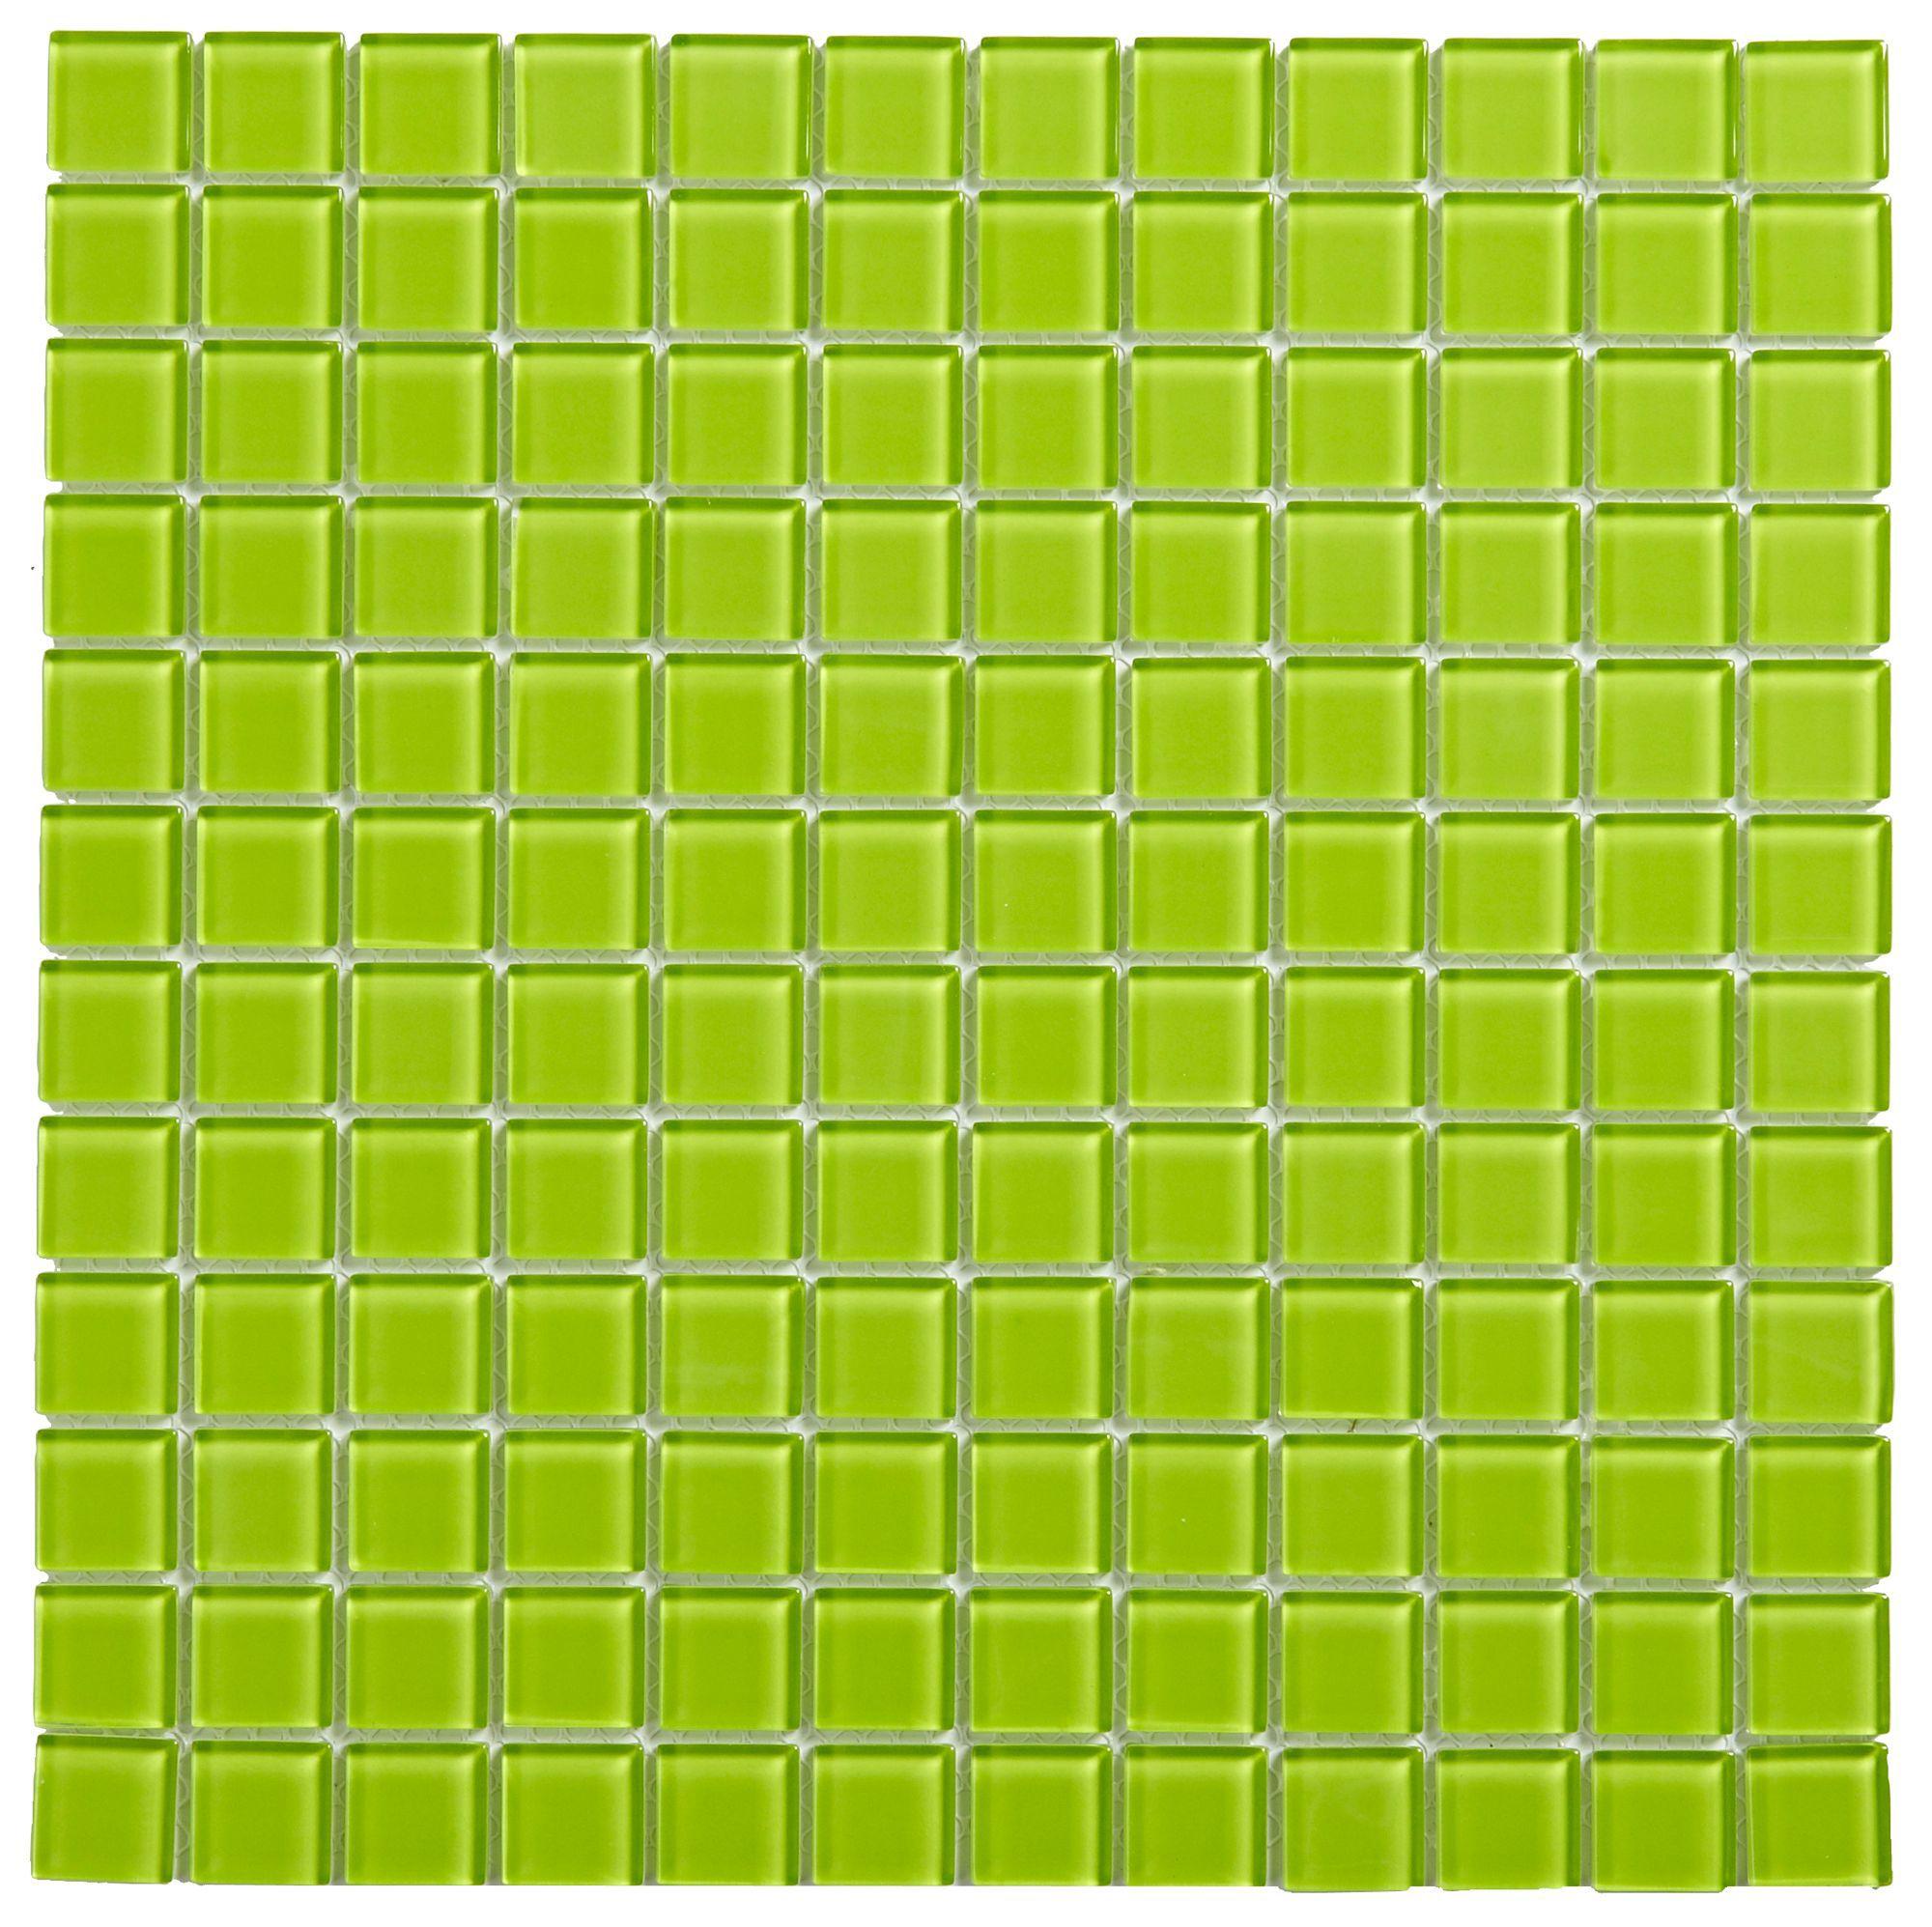 lime glass mosaic tile l 300mm w 300mm departments. Black Bedroom Furniture Sets. Home Design Ideas